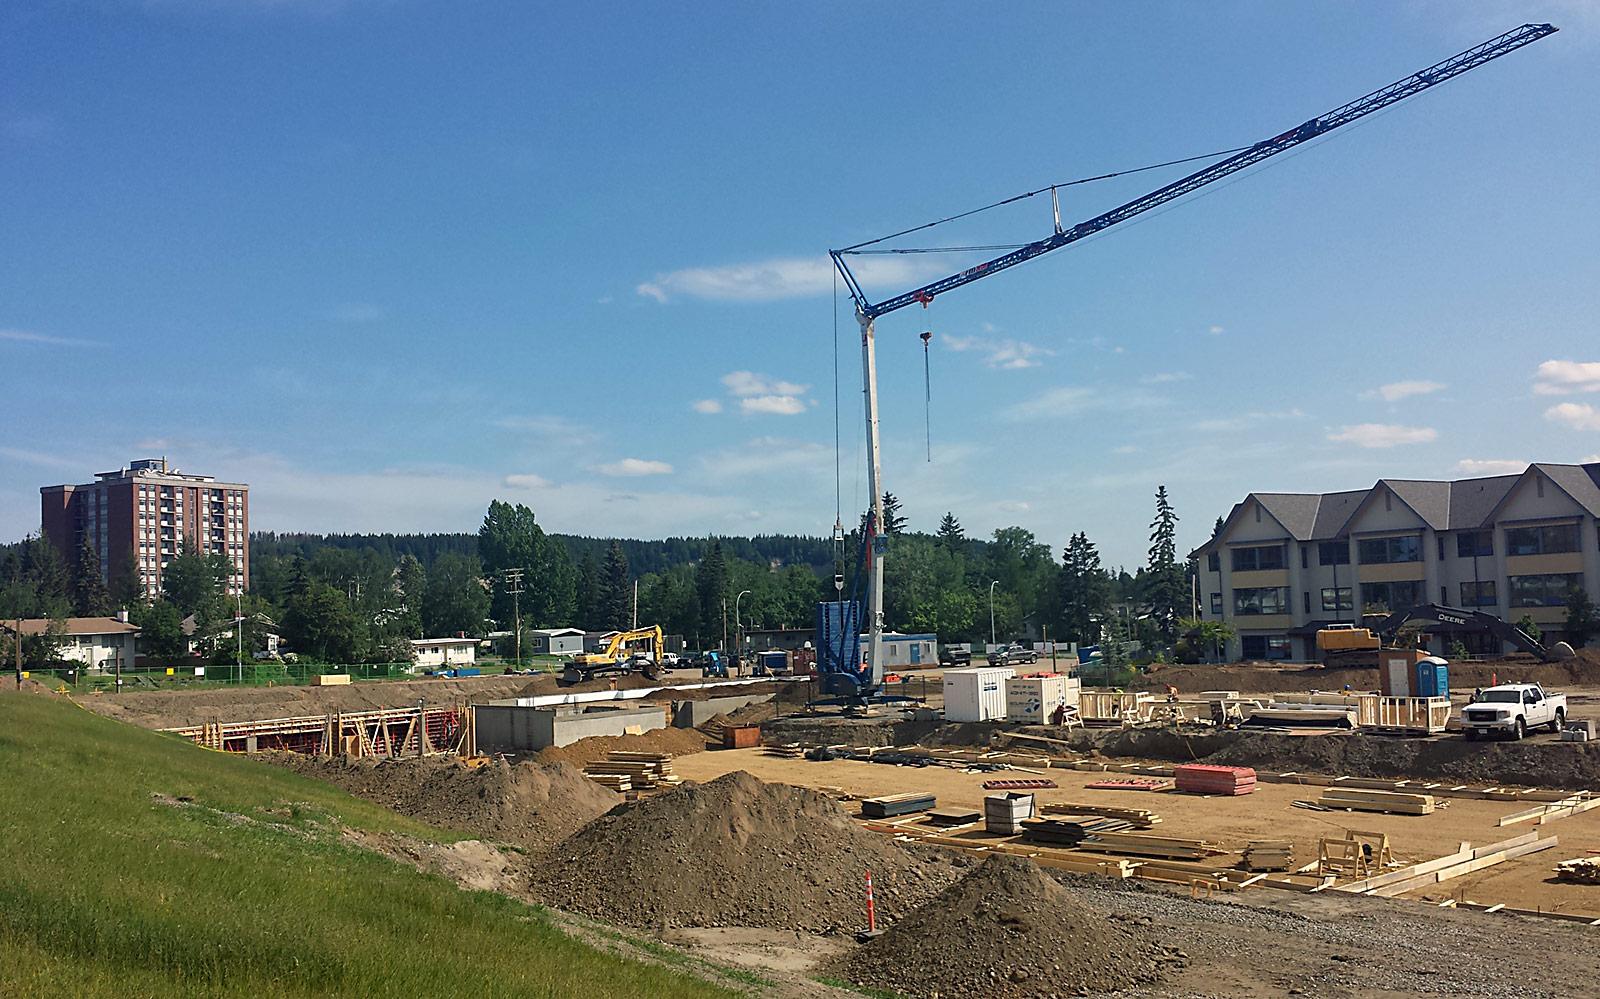 crane at RiverBend building site